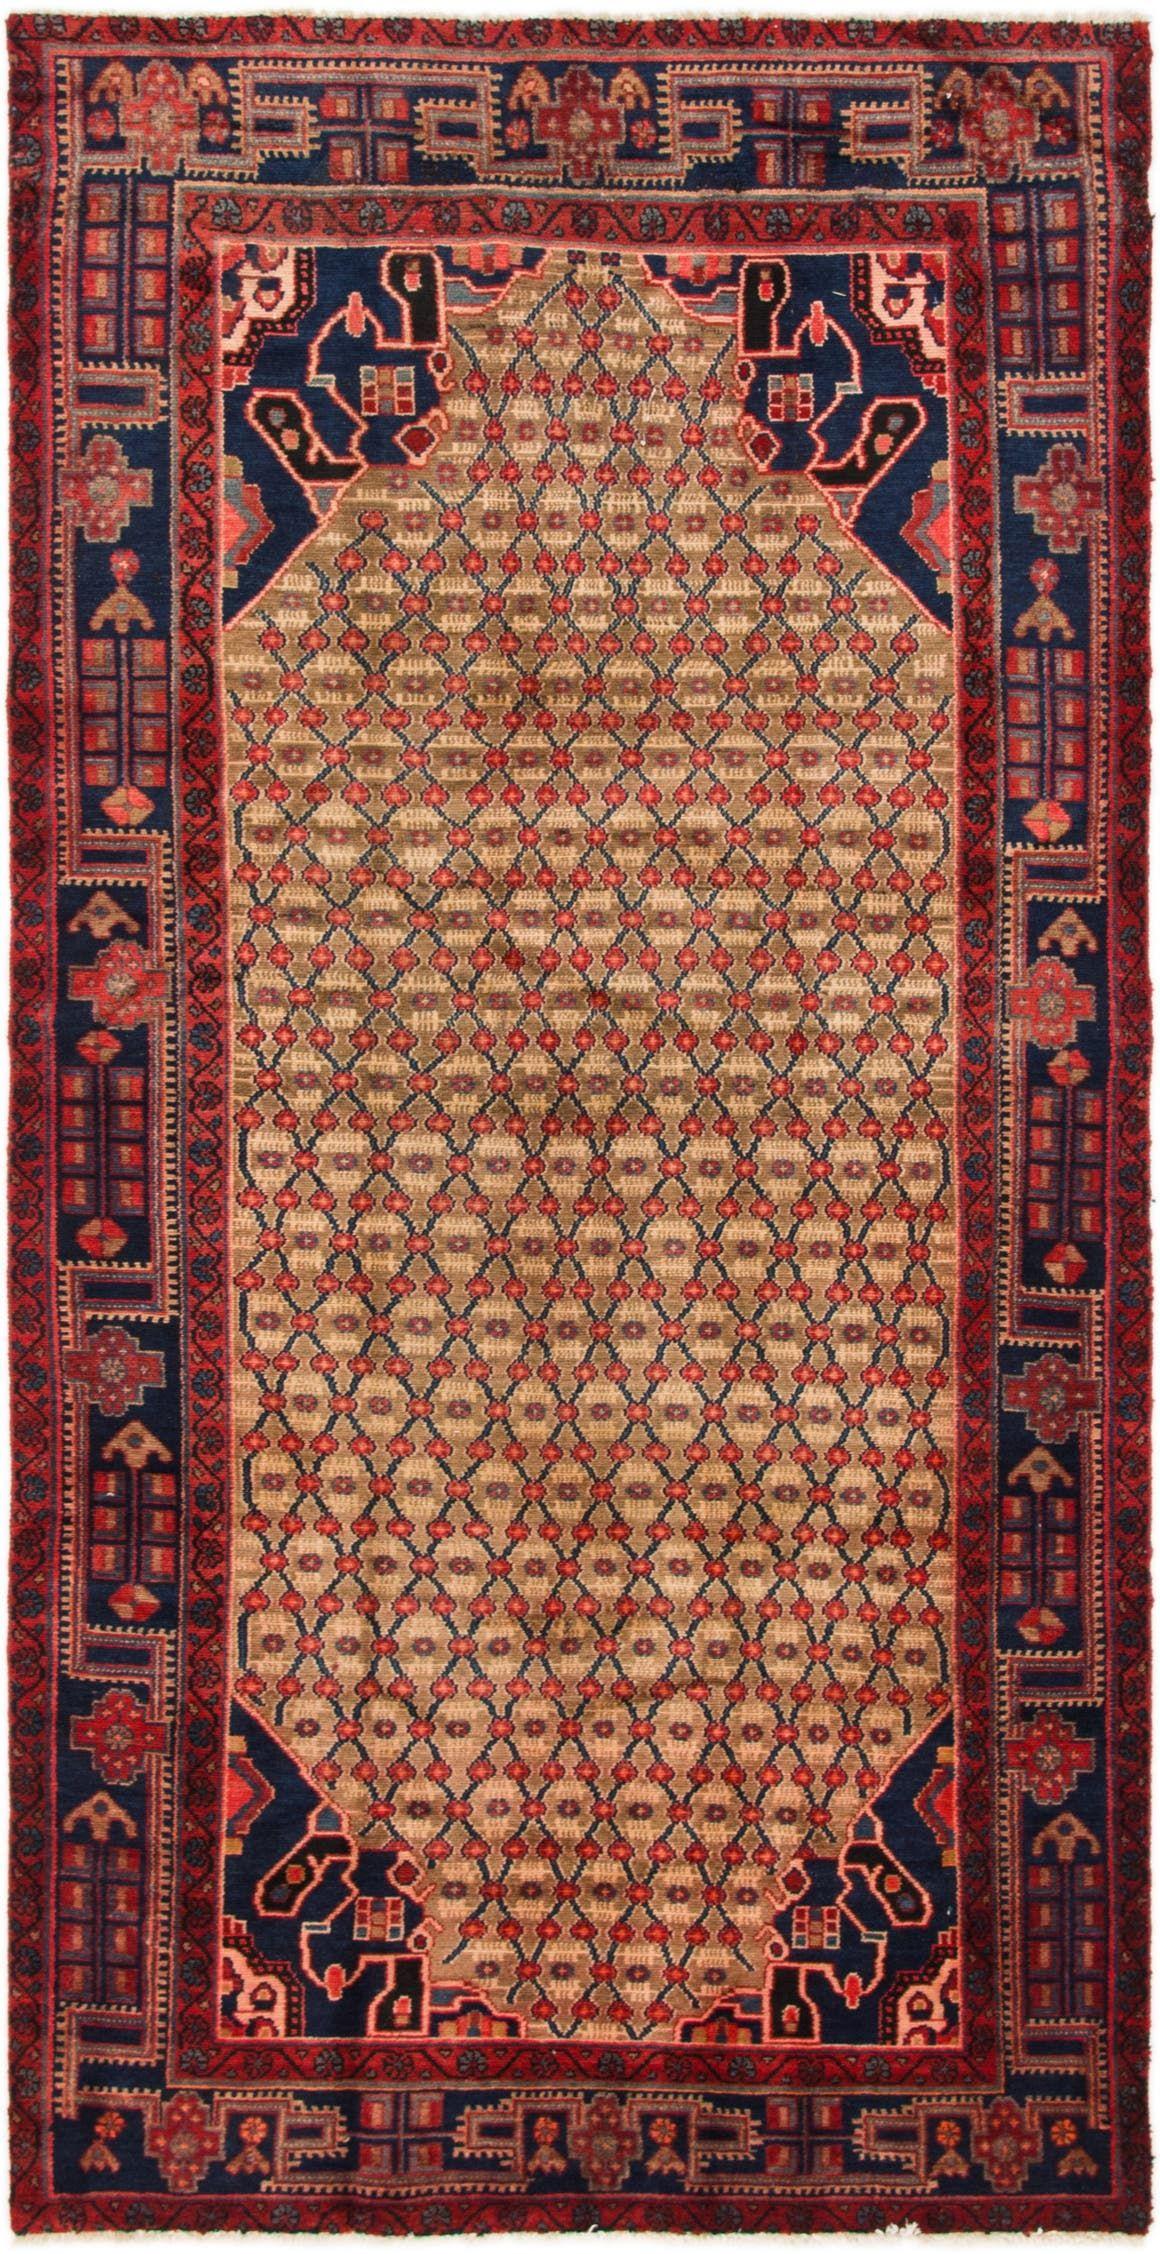 Koliaei Beige Antique 10 Ft Runner Area Rug In 2020 Rugs On Carpet Persian Rug Runners Rugs